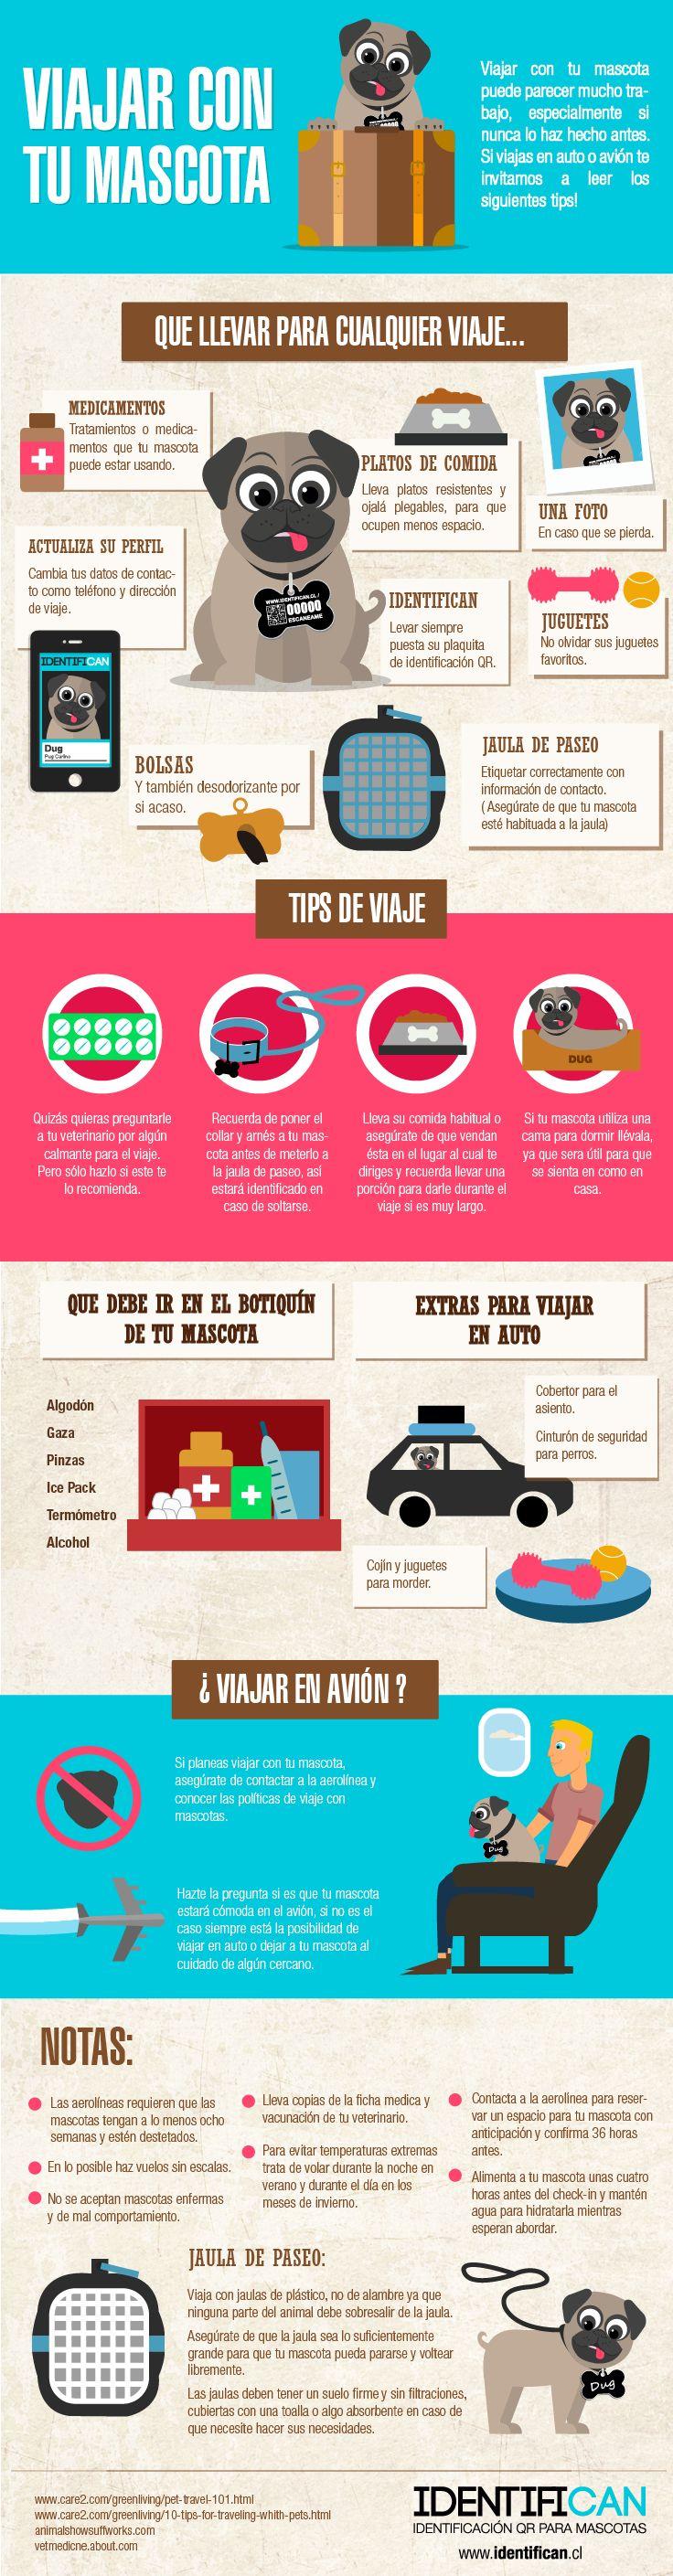 Consejos para viajar con tu mascota - Tips for traveling with your pet